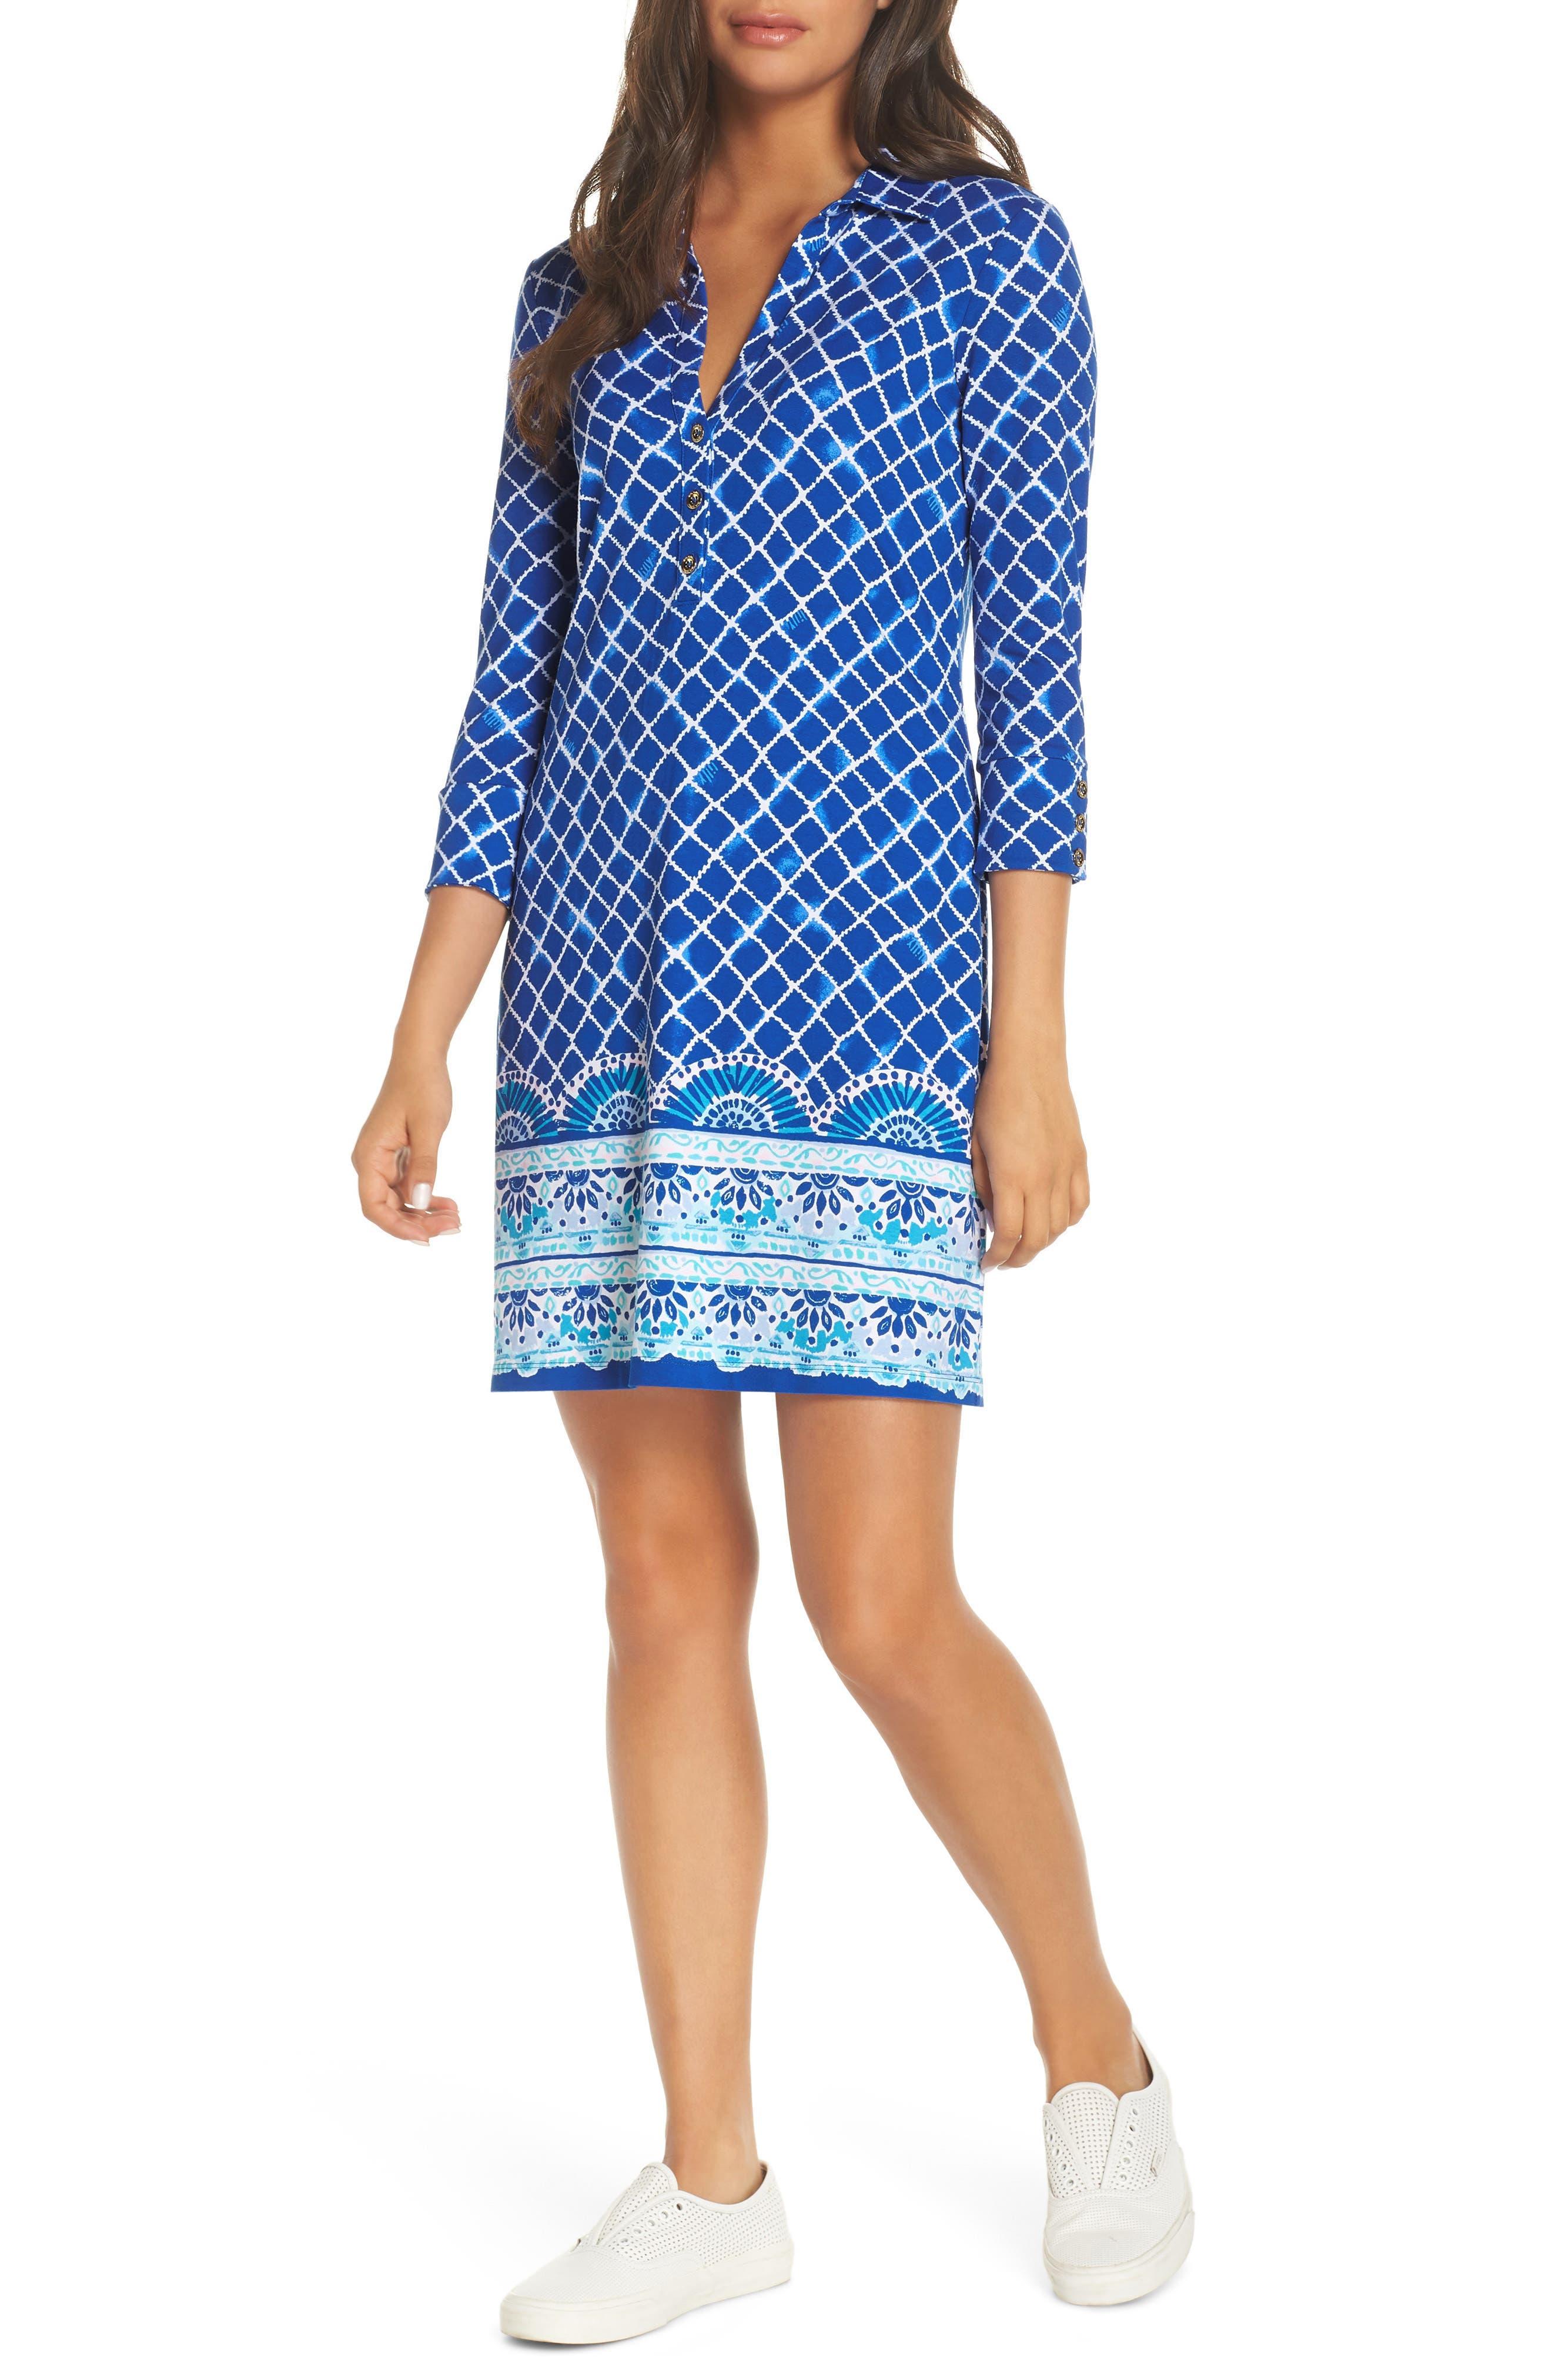 Lilly Pulitzer Ansley Upf 50+ Polo Shift Dress, Blue